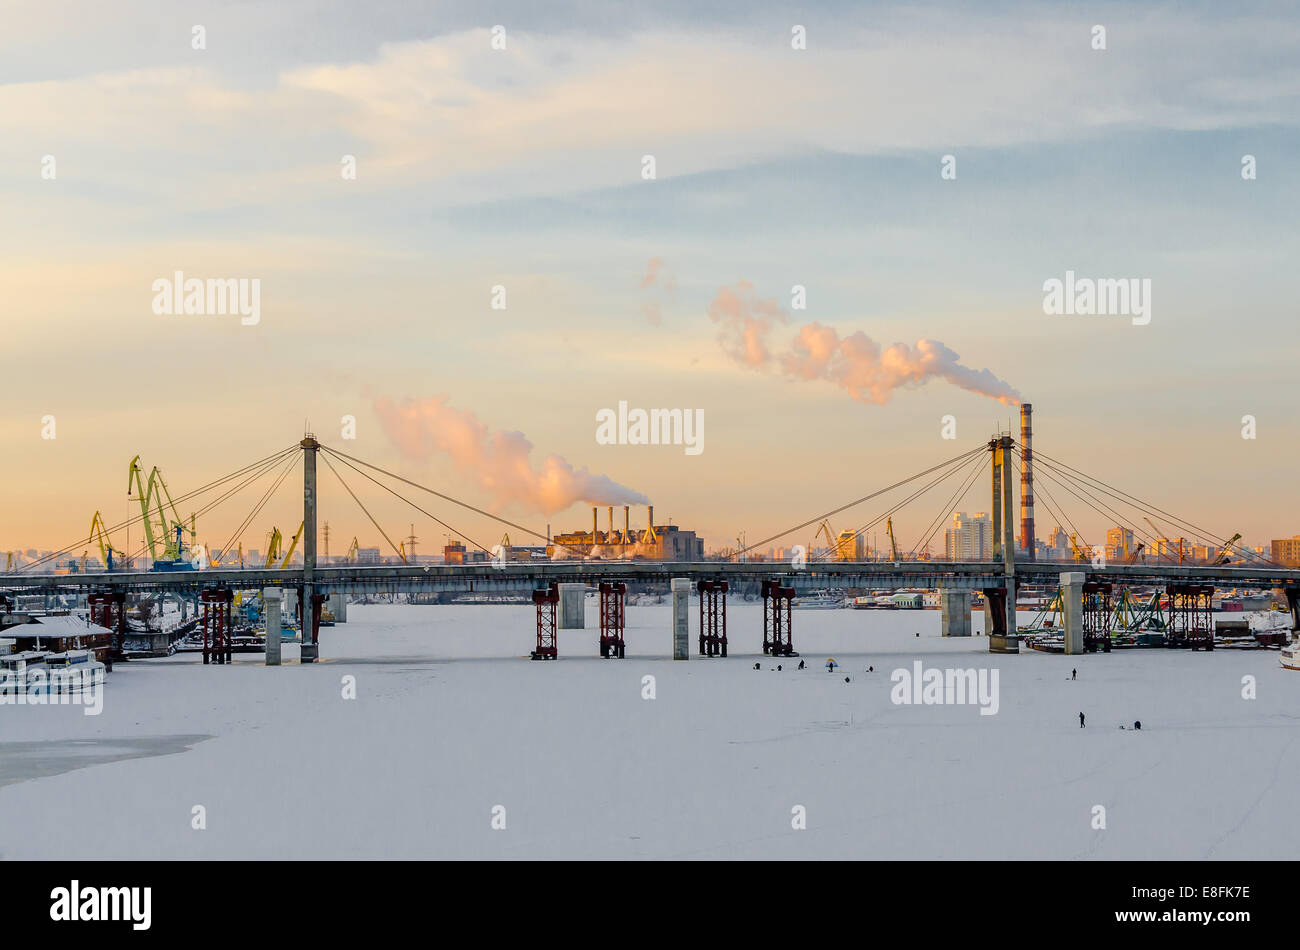 Ukraine, Kyiv, Industrial view - Stock Image